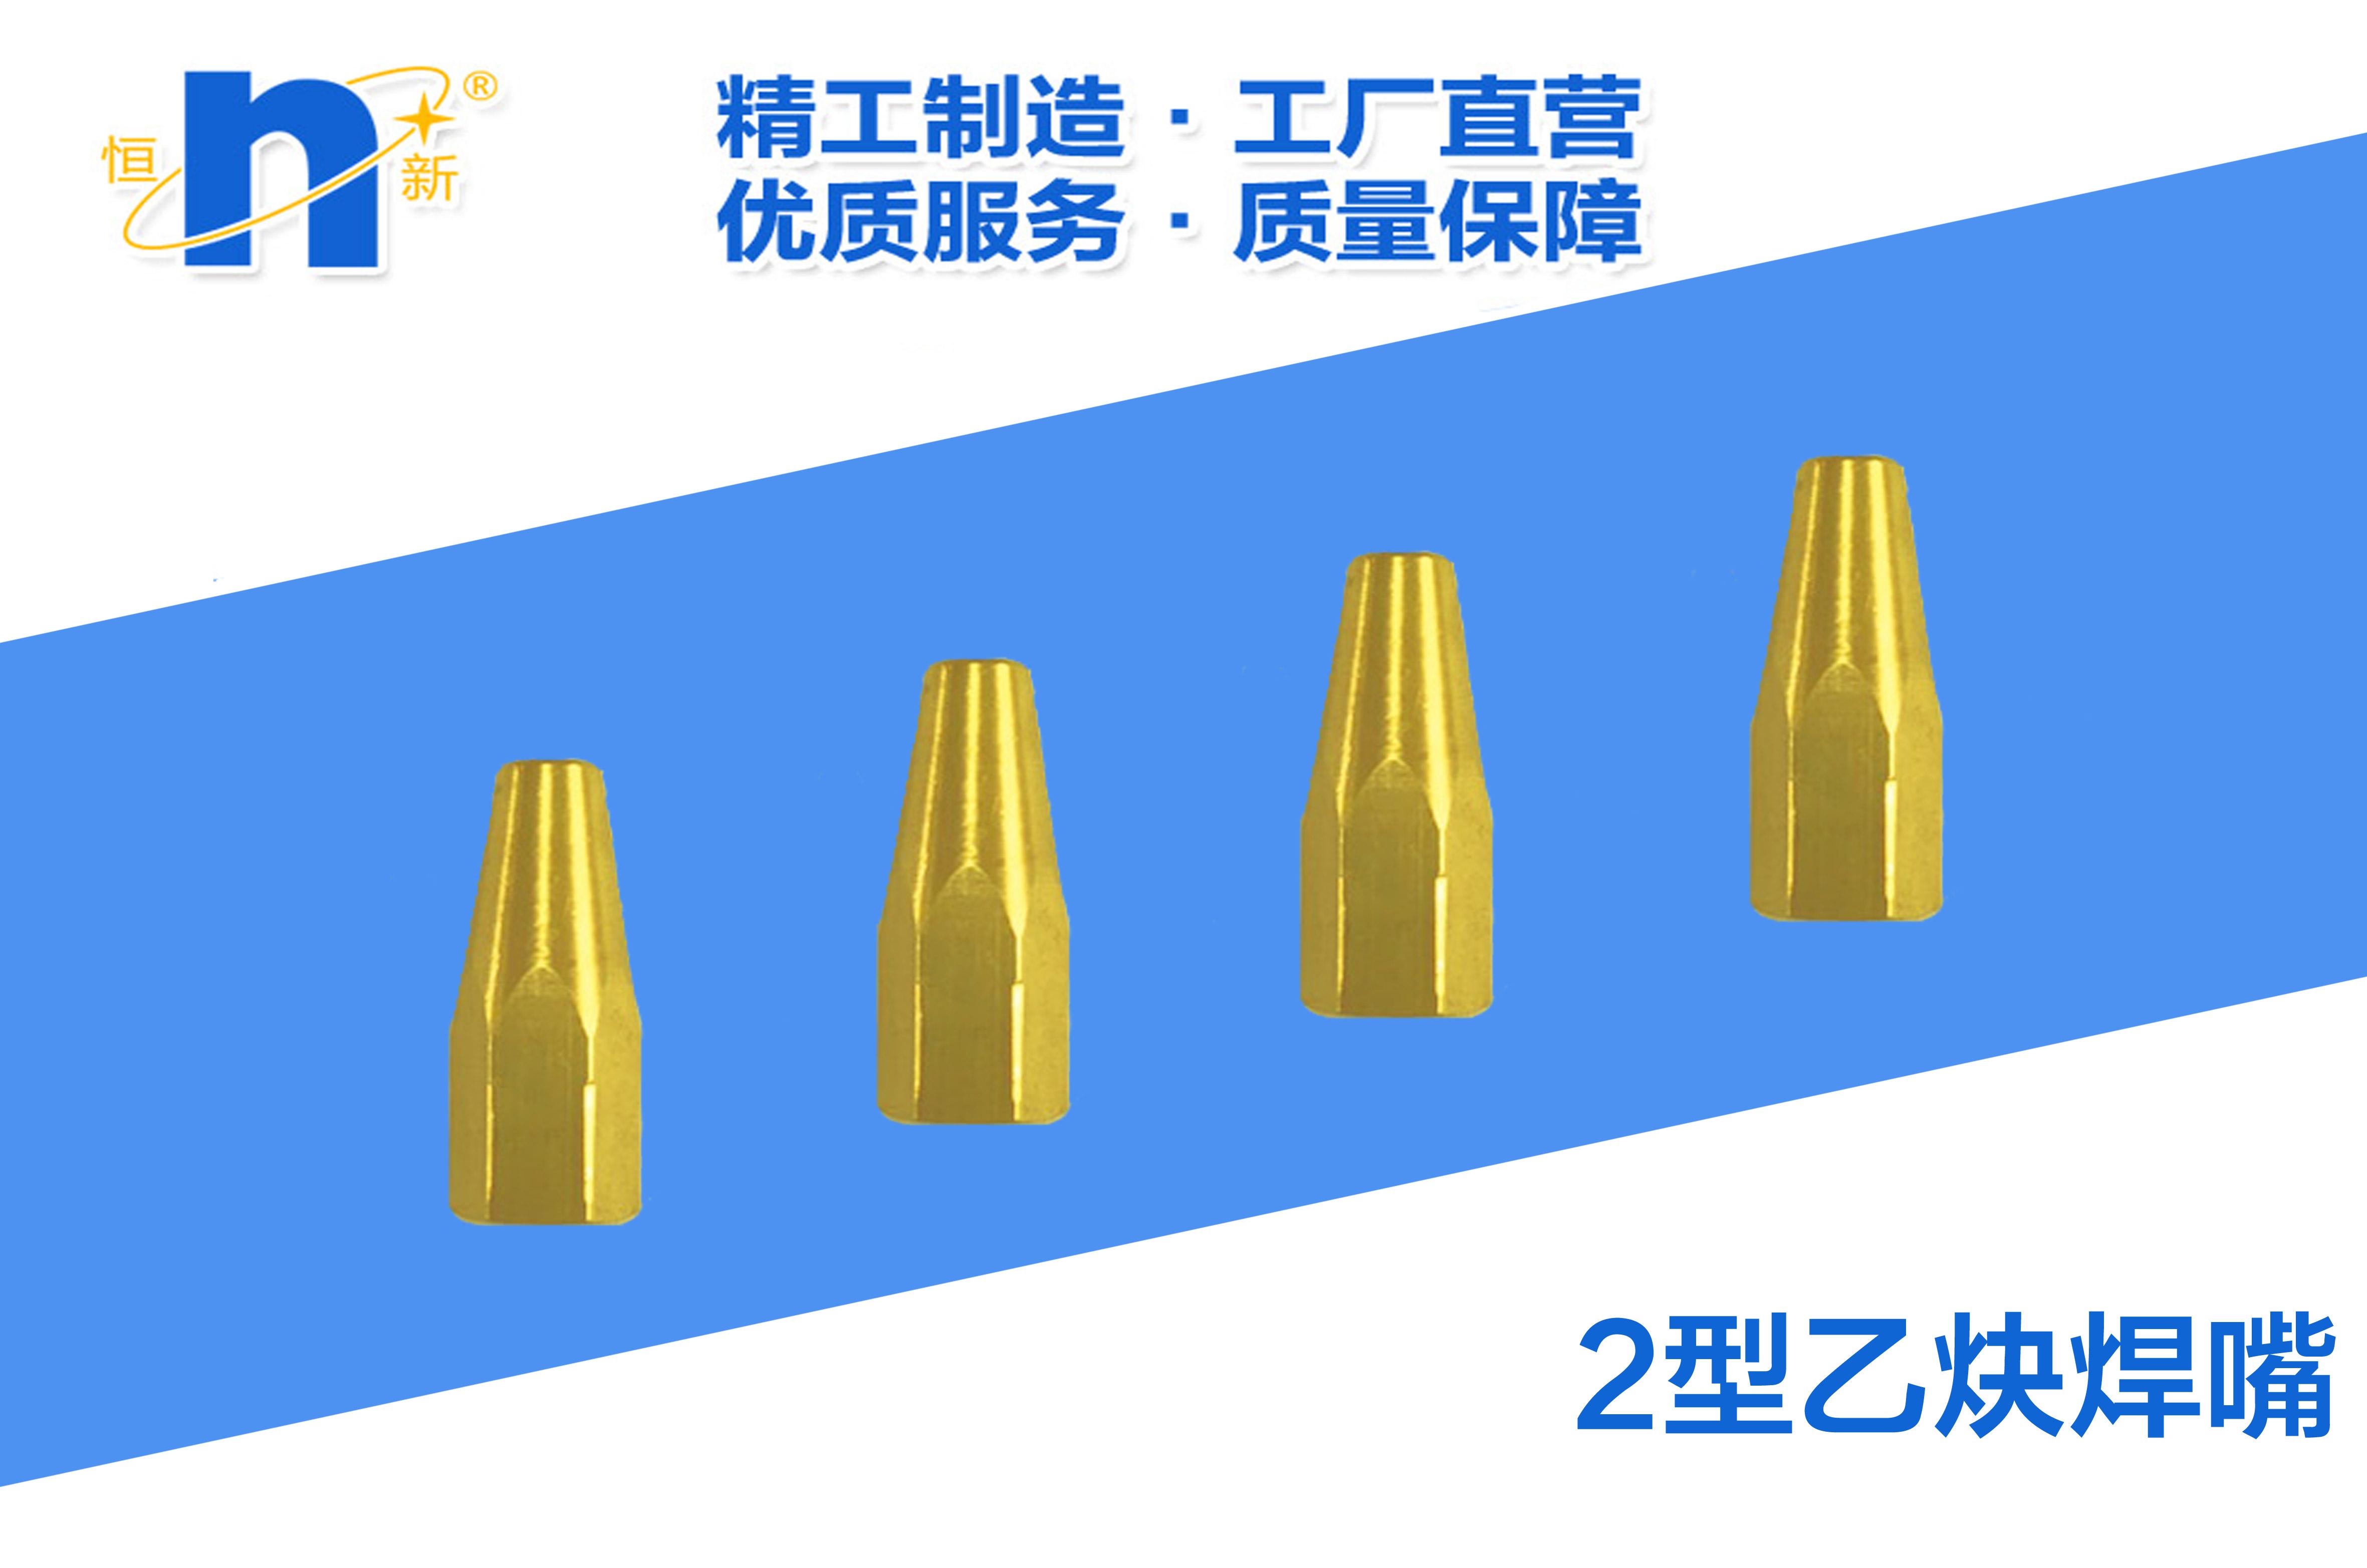 2型乙炔焊嘴